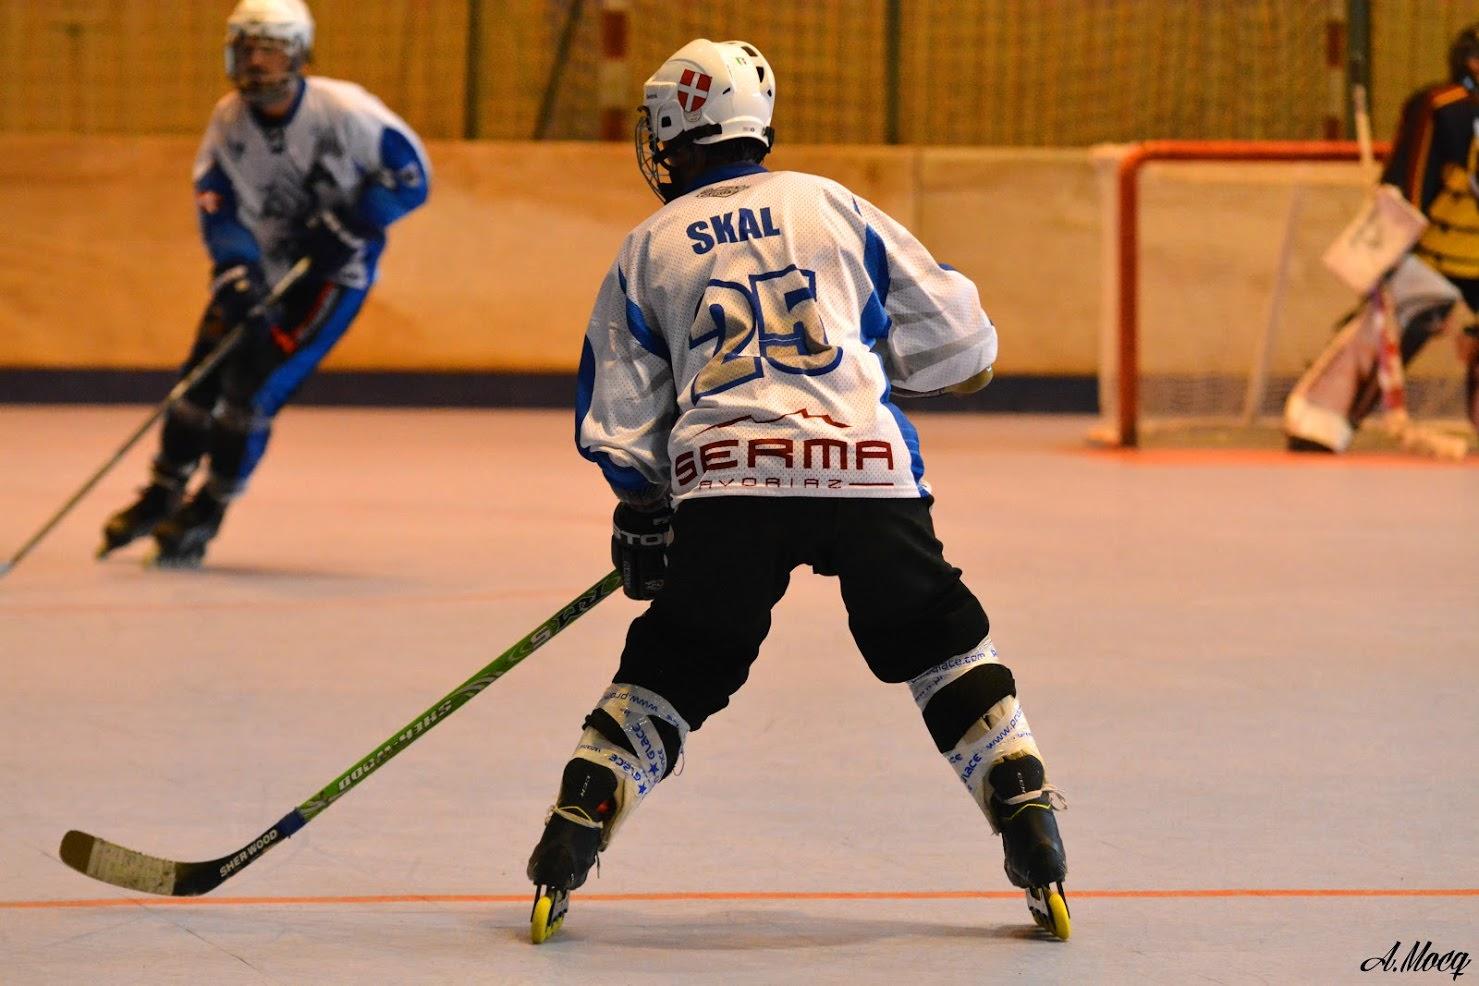 Rollers hockey